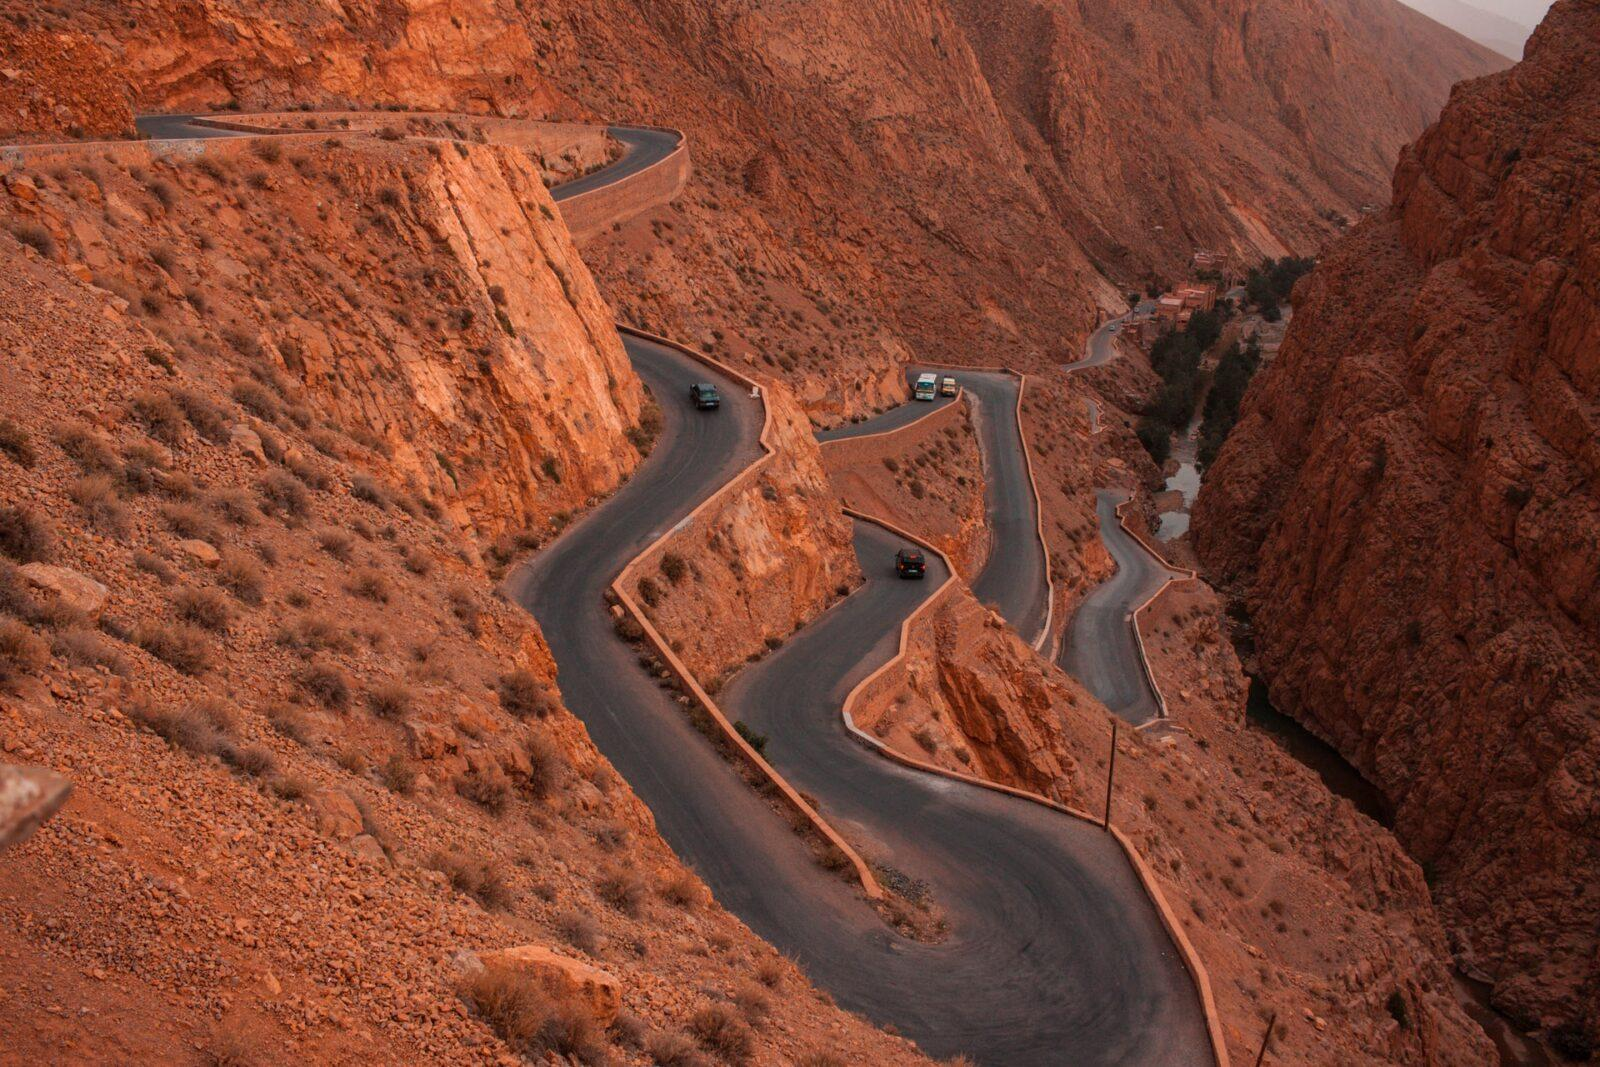 frida aguilar estrada 9tiVcbwbZ9M unsplash 1536x1024 - Guide Morocco Tours